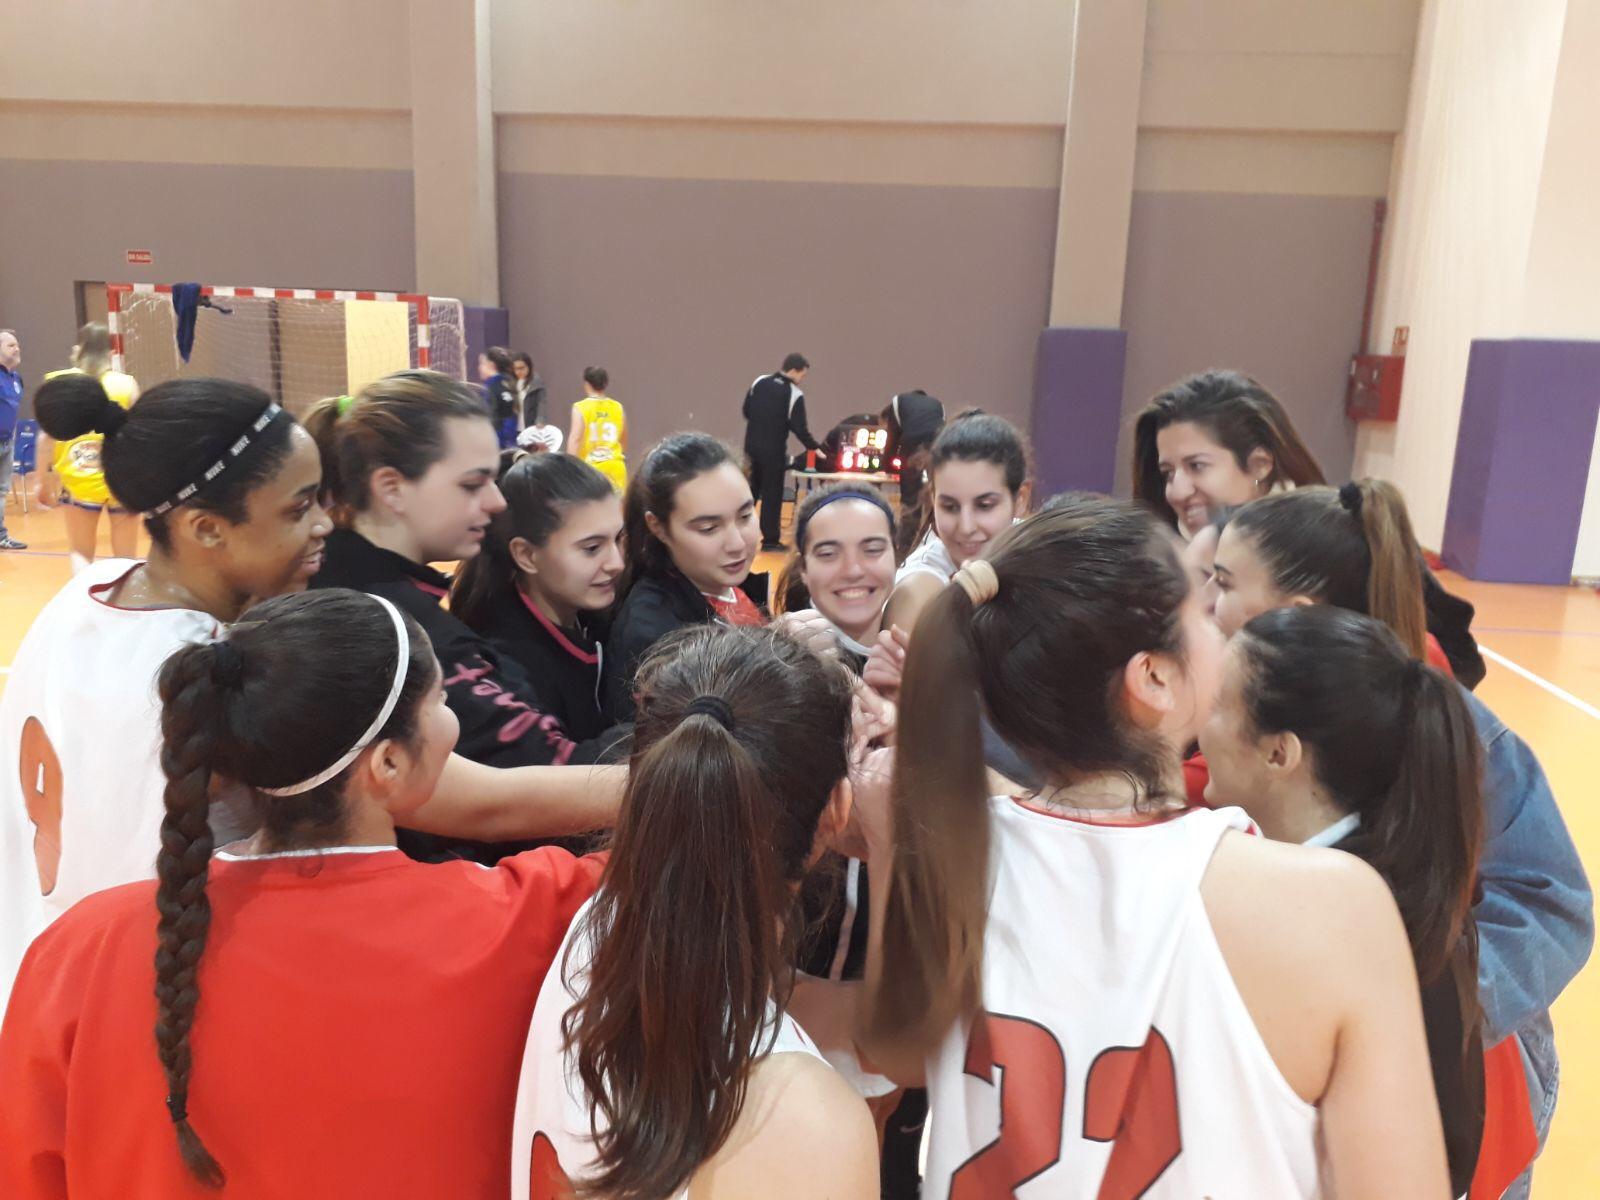 #SeniorFemA Campeonato Autonómico. Grupo A. Jornada 5: Burjassot C.B. 59 – C.B. L'Horta Godella 72